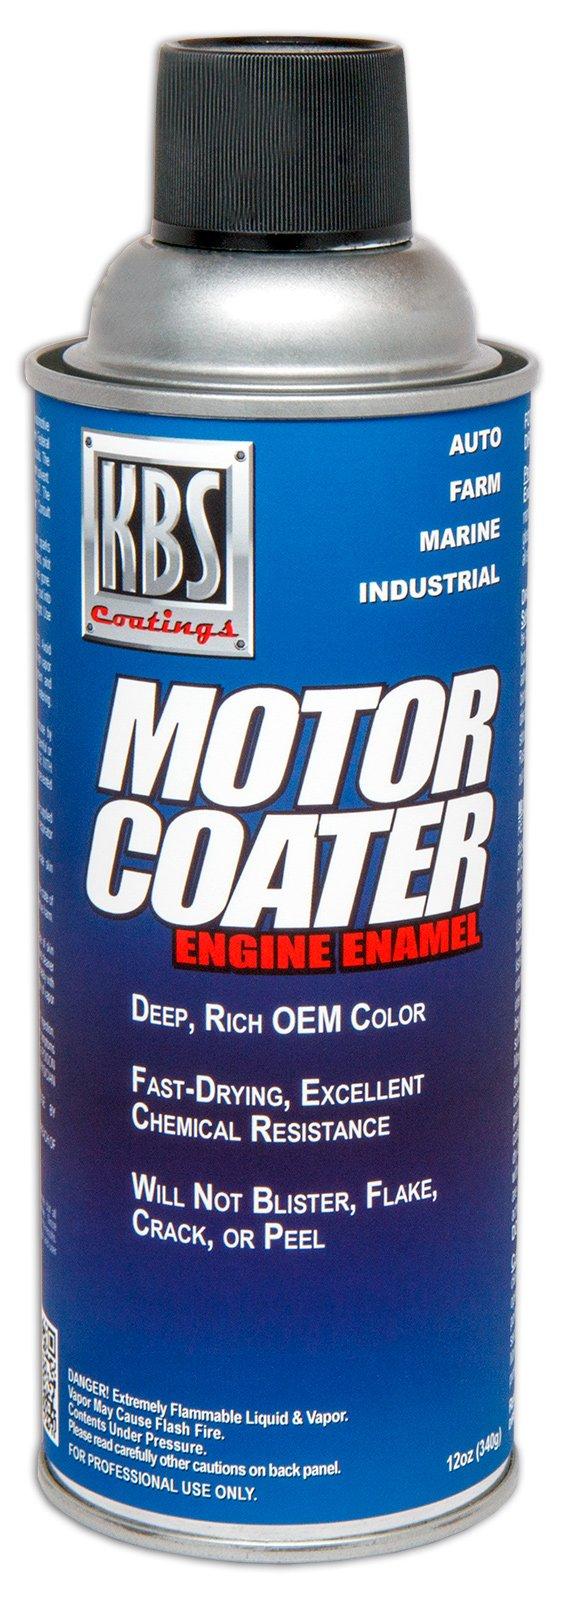 KBS Coatings 60109 Fire Red Motor Coater Engine Paint - 12 fl. oz.